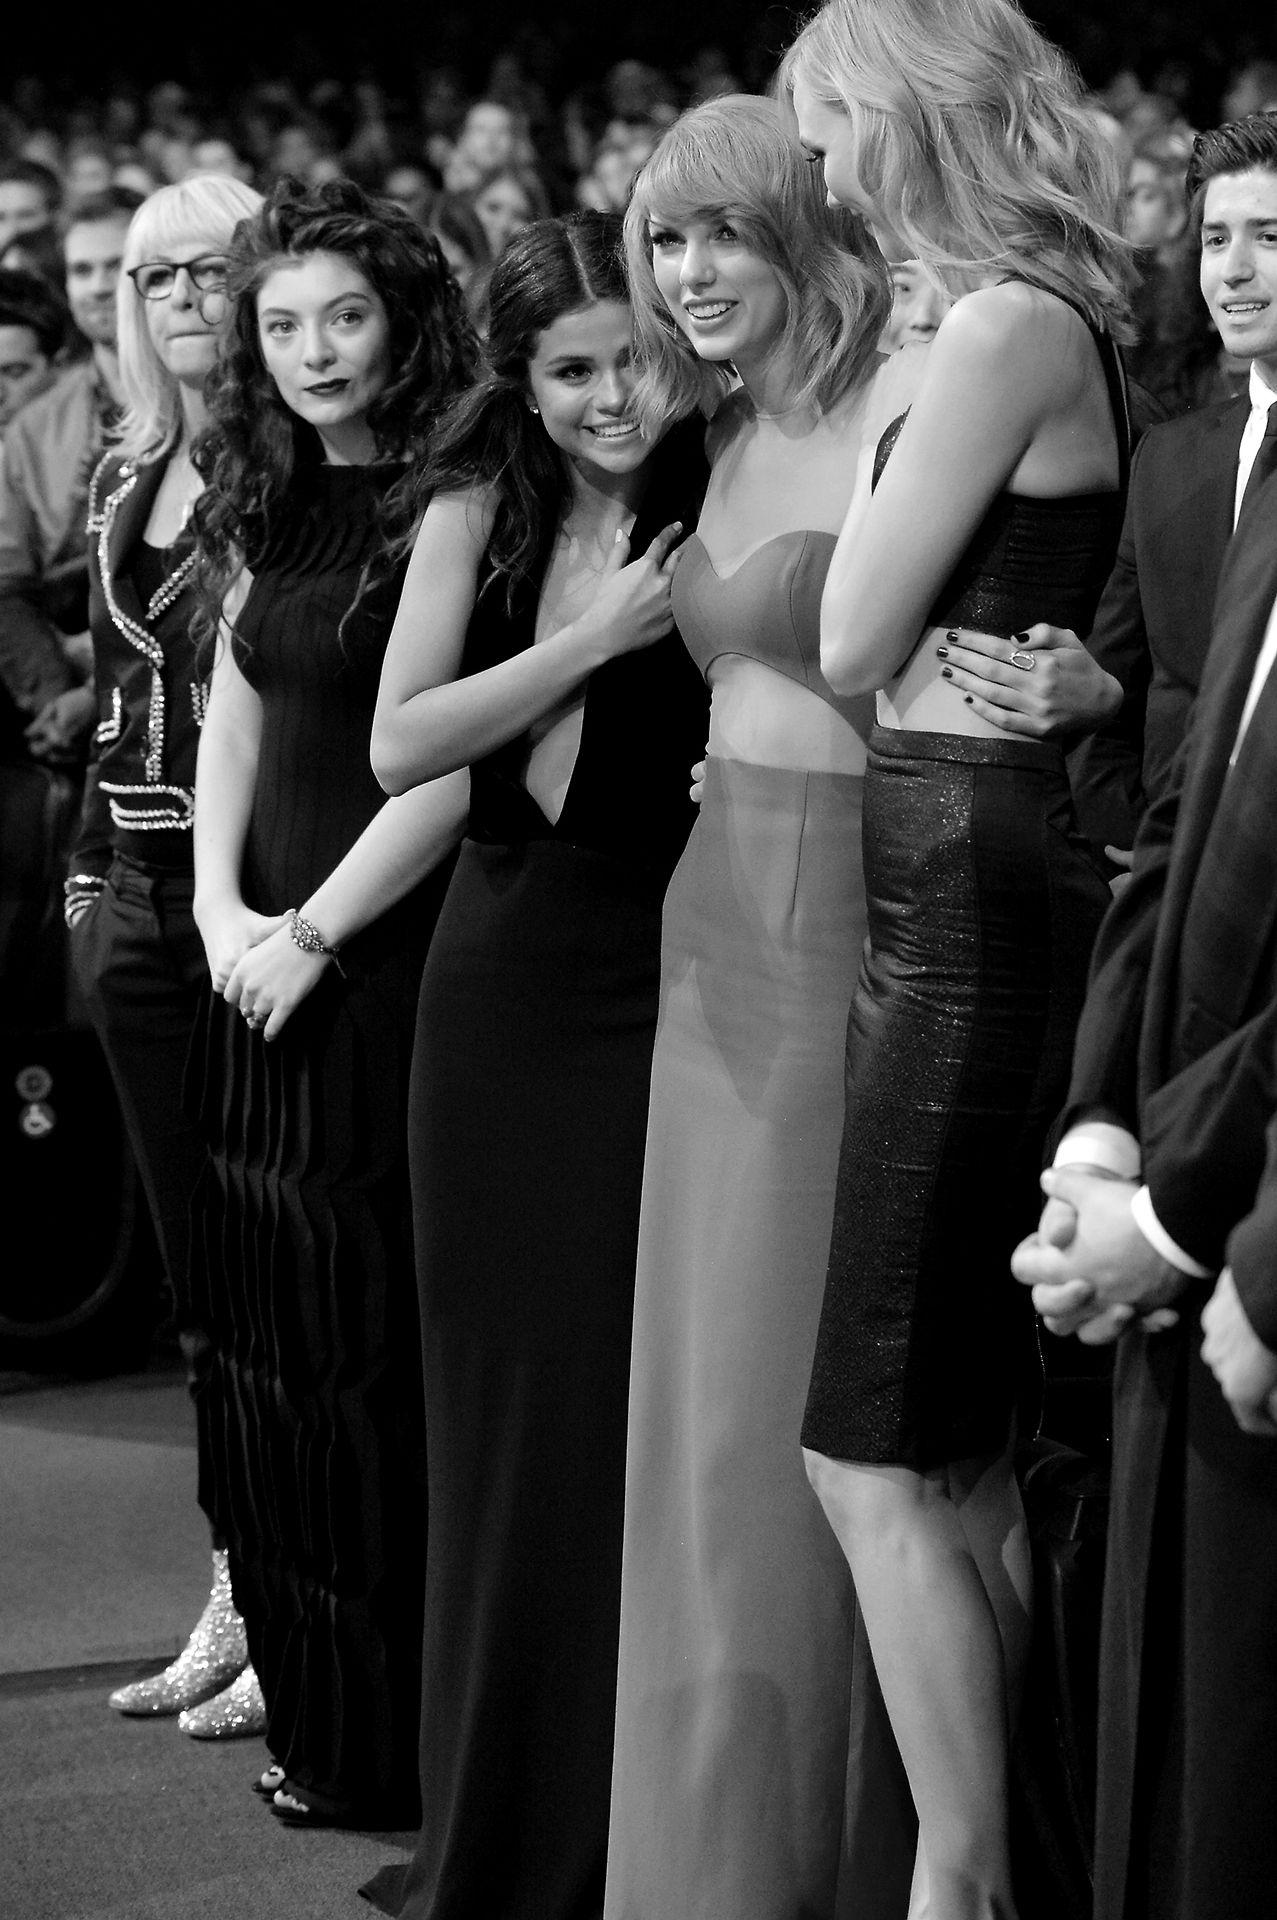 Selena Gomez Taylor Swift Karlie Kloss Lorde Ama S With